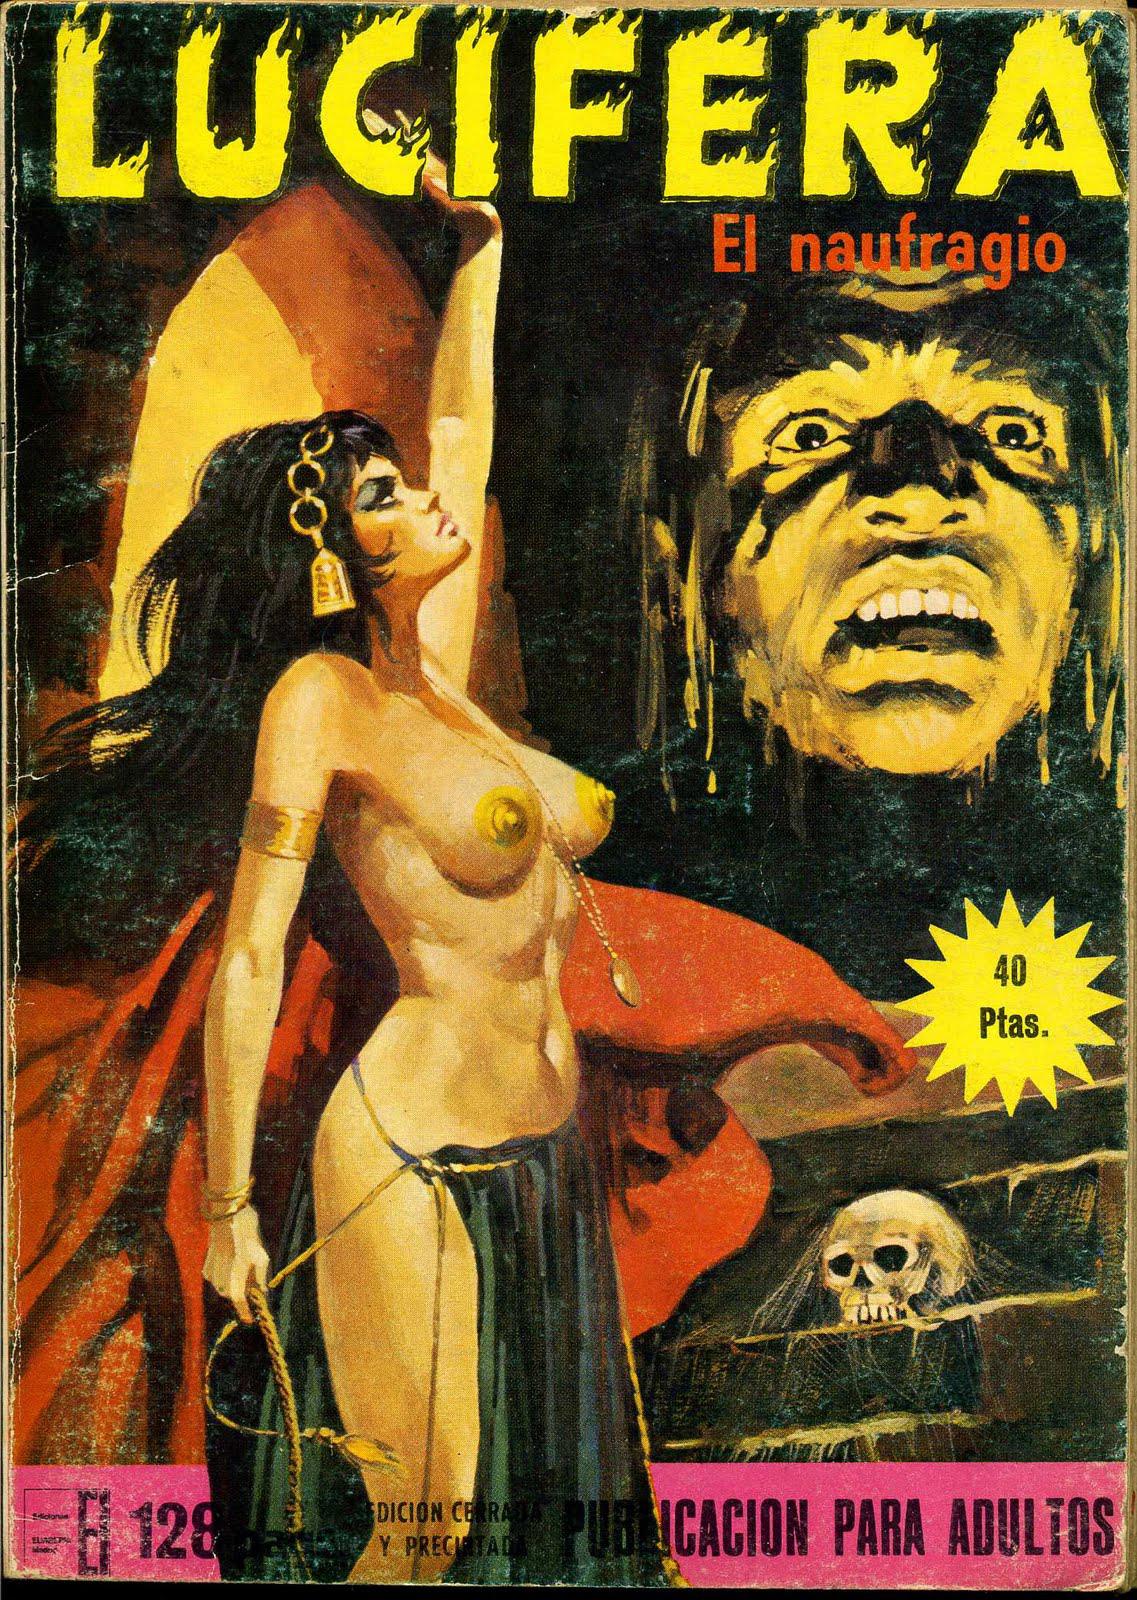 aa-0053-revista-erotica-lucifera-para-adultos-espana-postfranquismo-erotismo